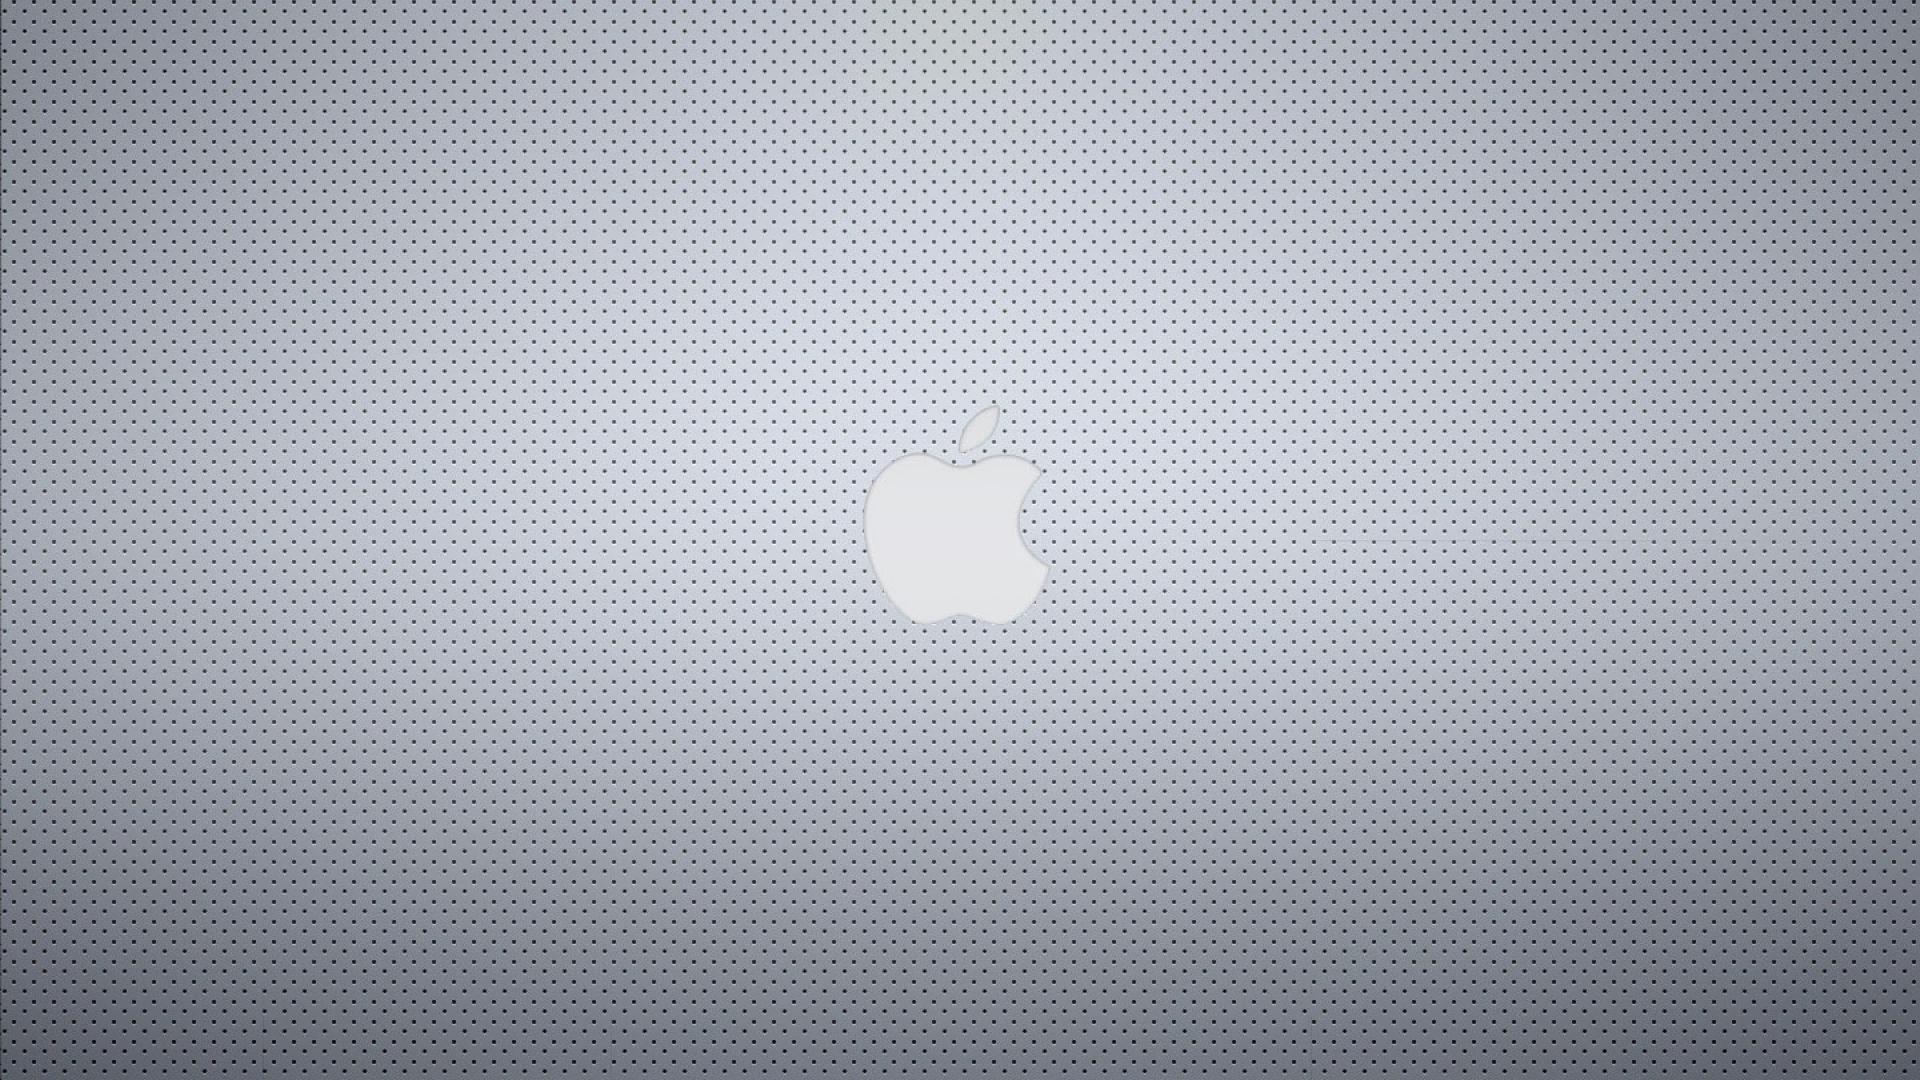 OS X Dashboard Wallpaper